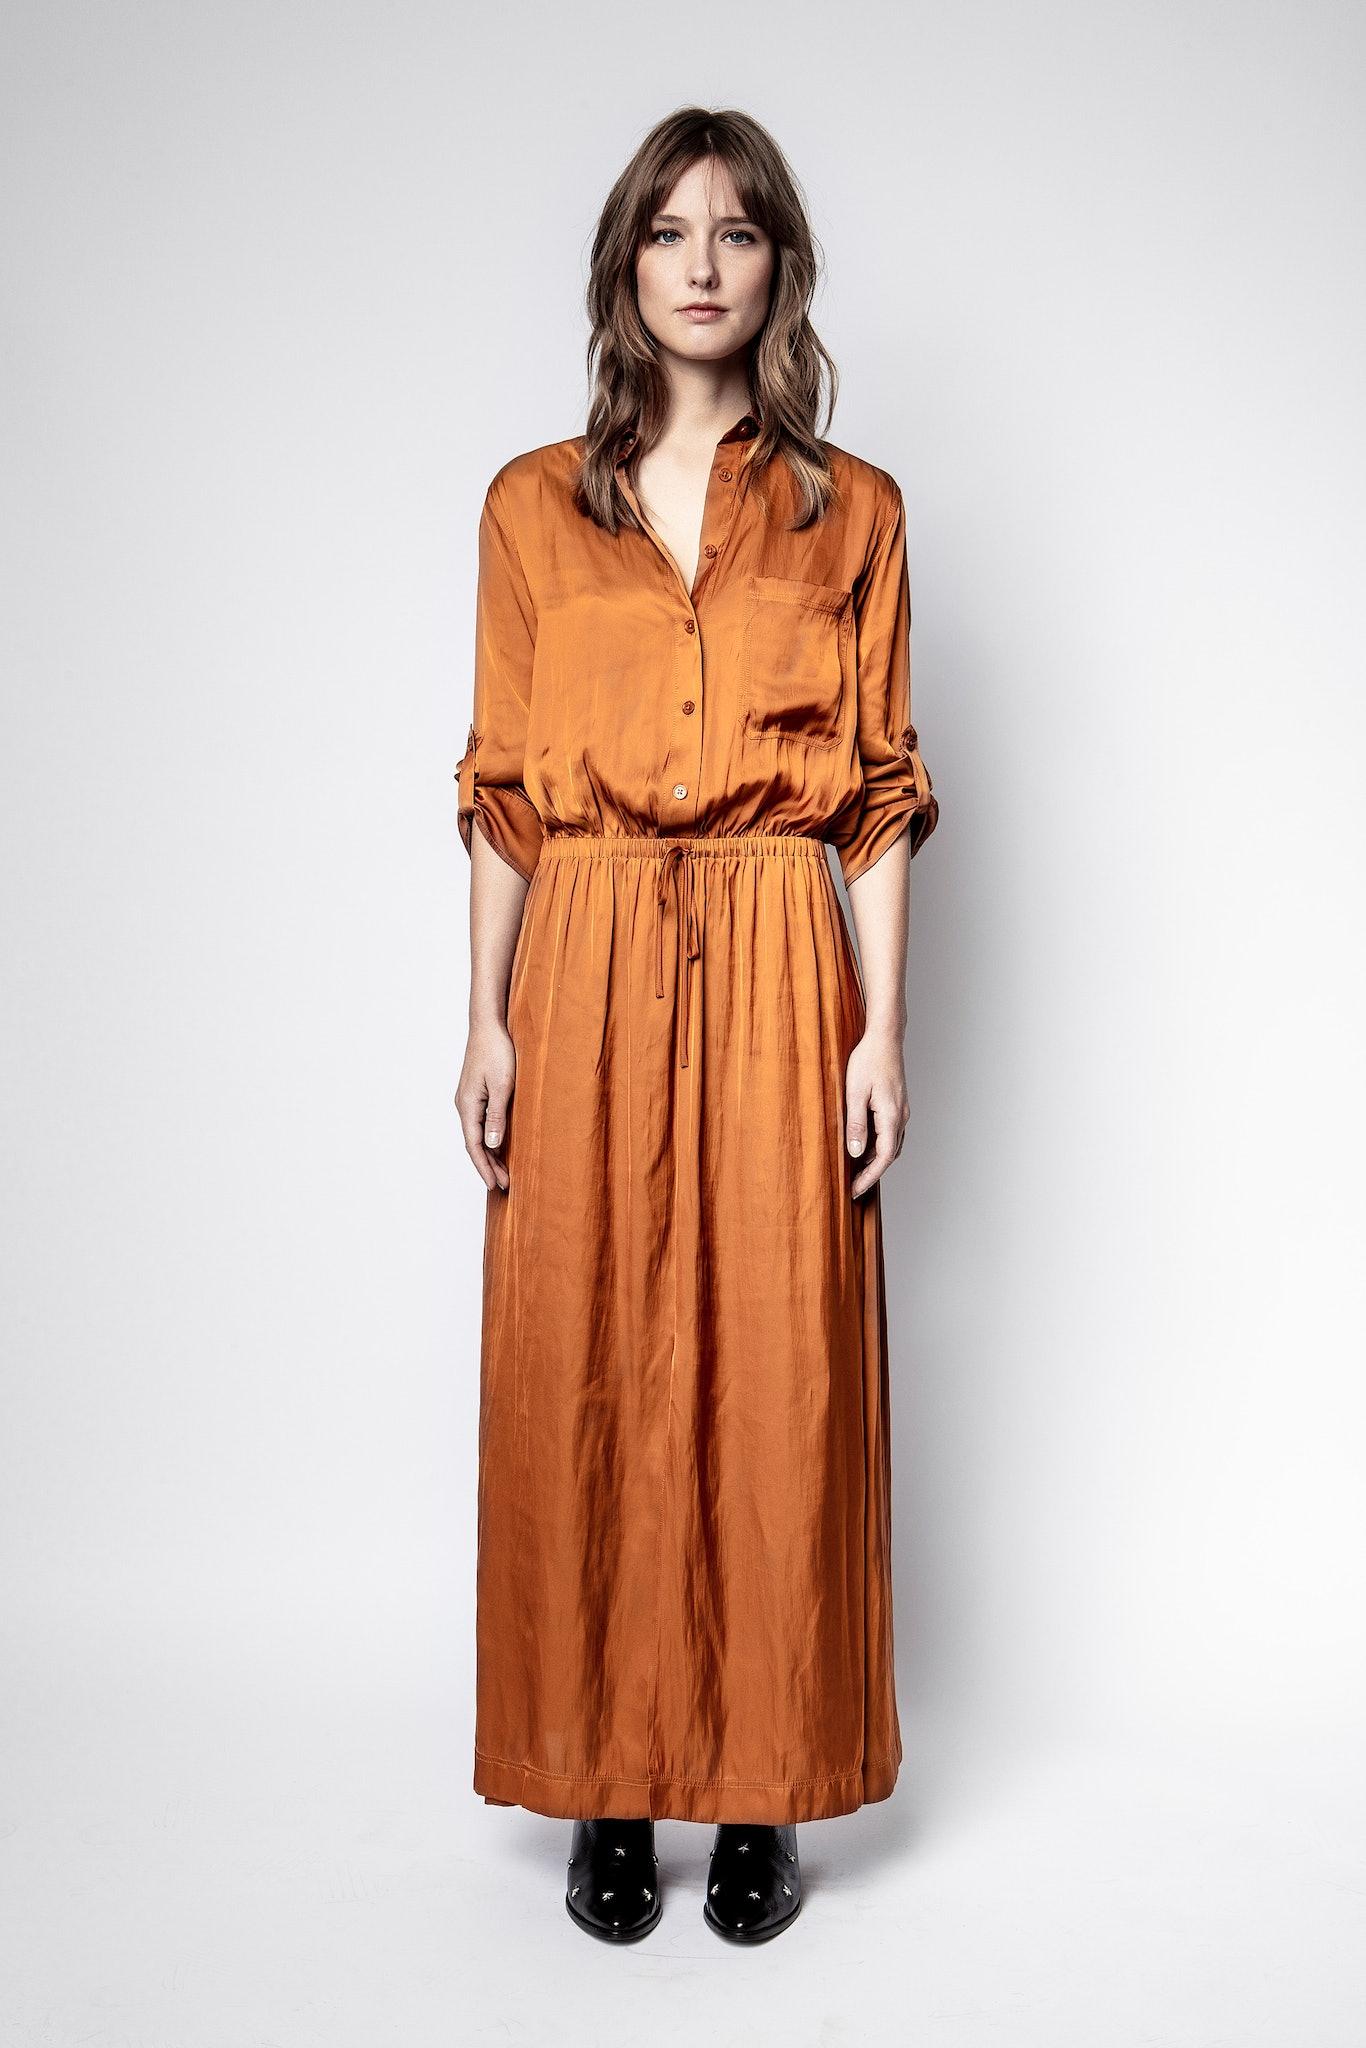 Radial Satin Dress